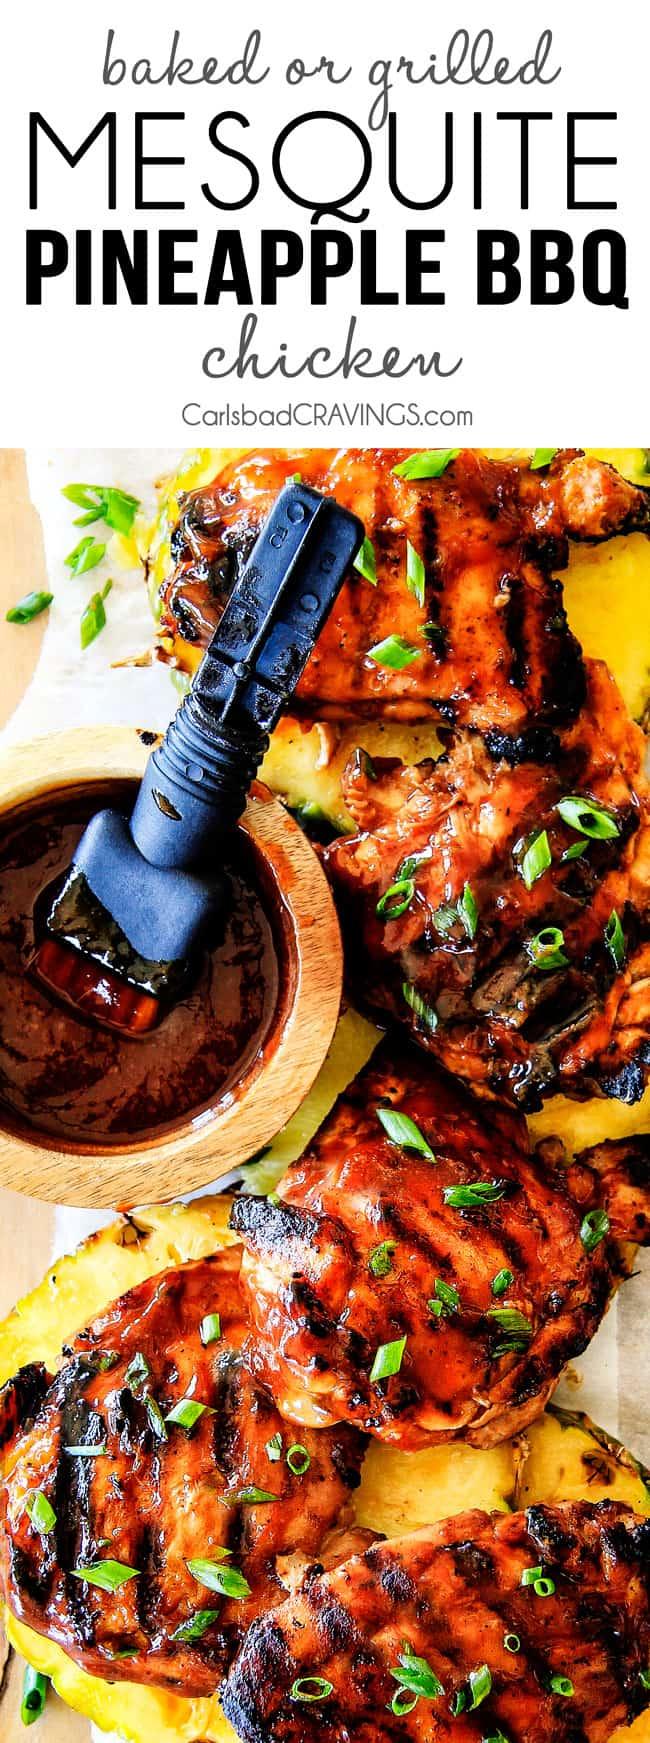 Mesquite Pineapple BBQ Chicken